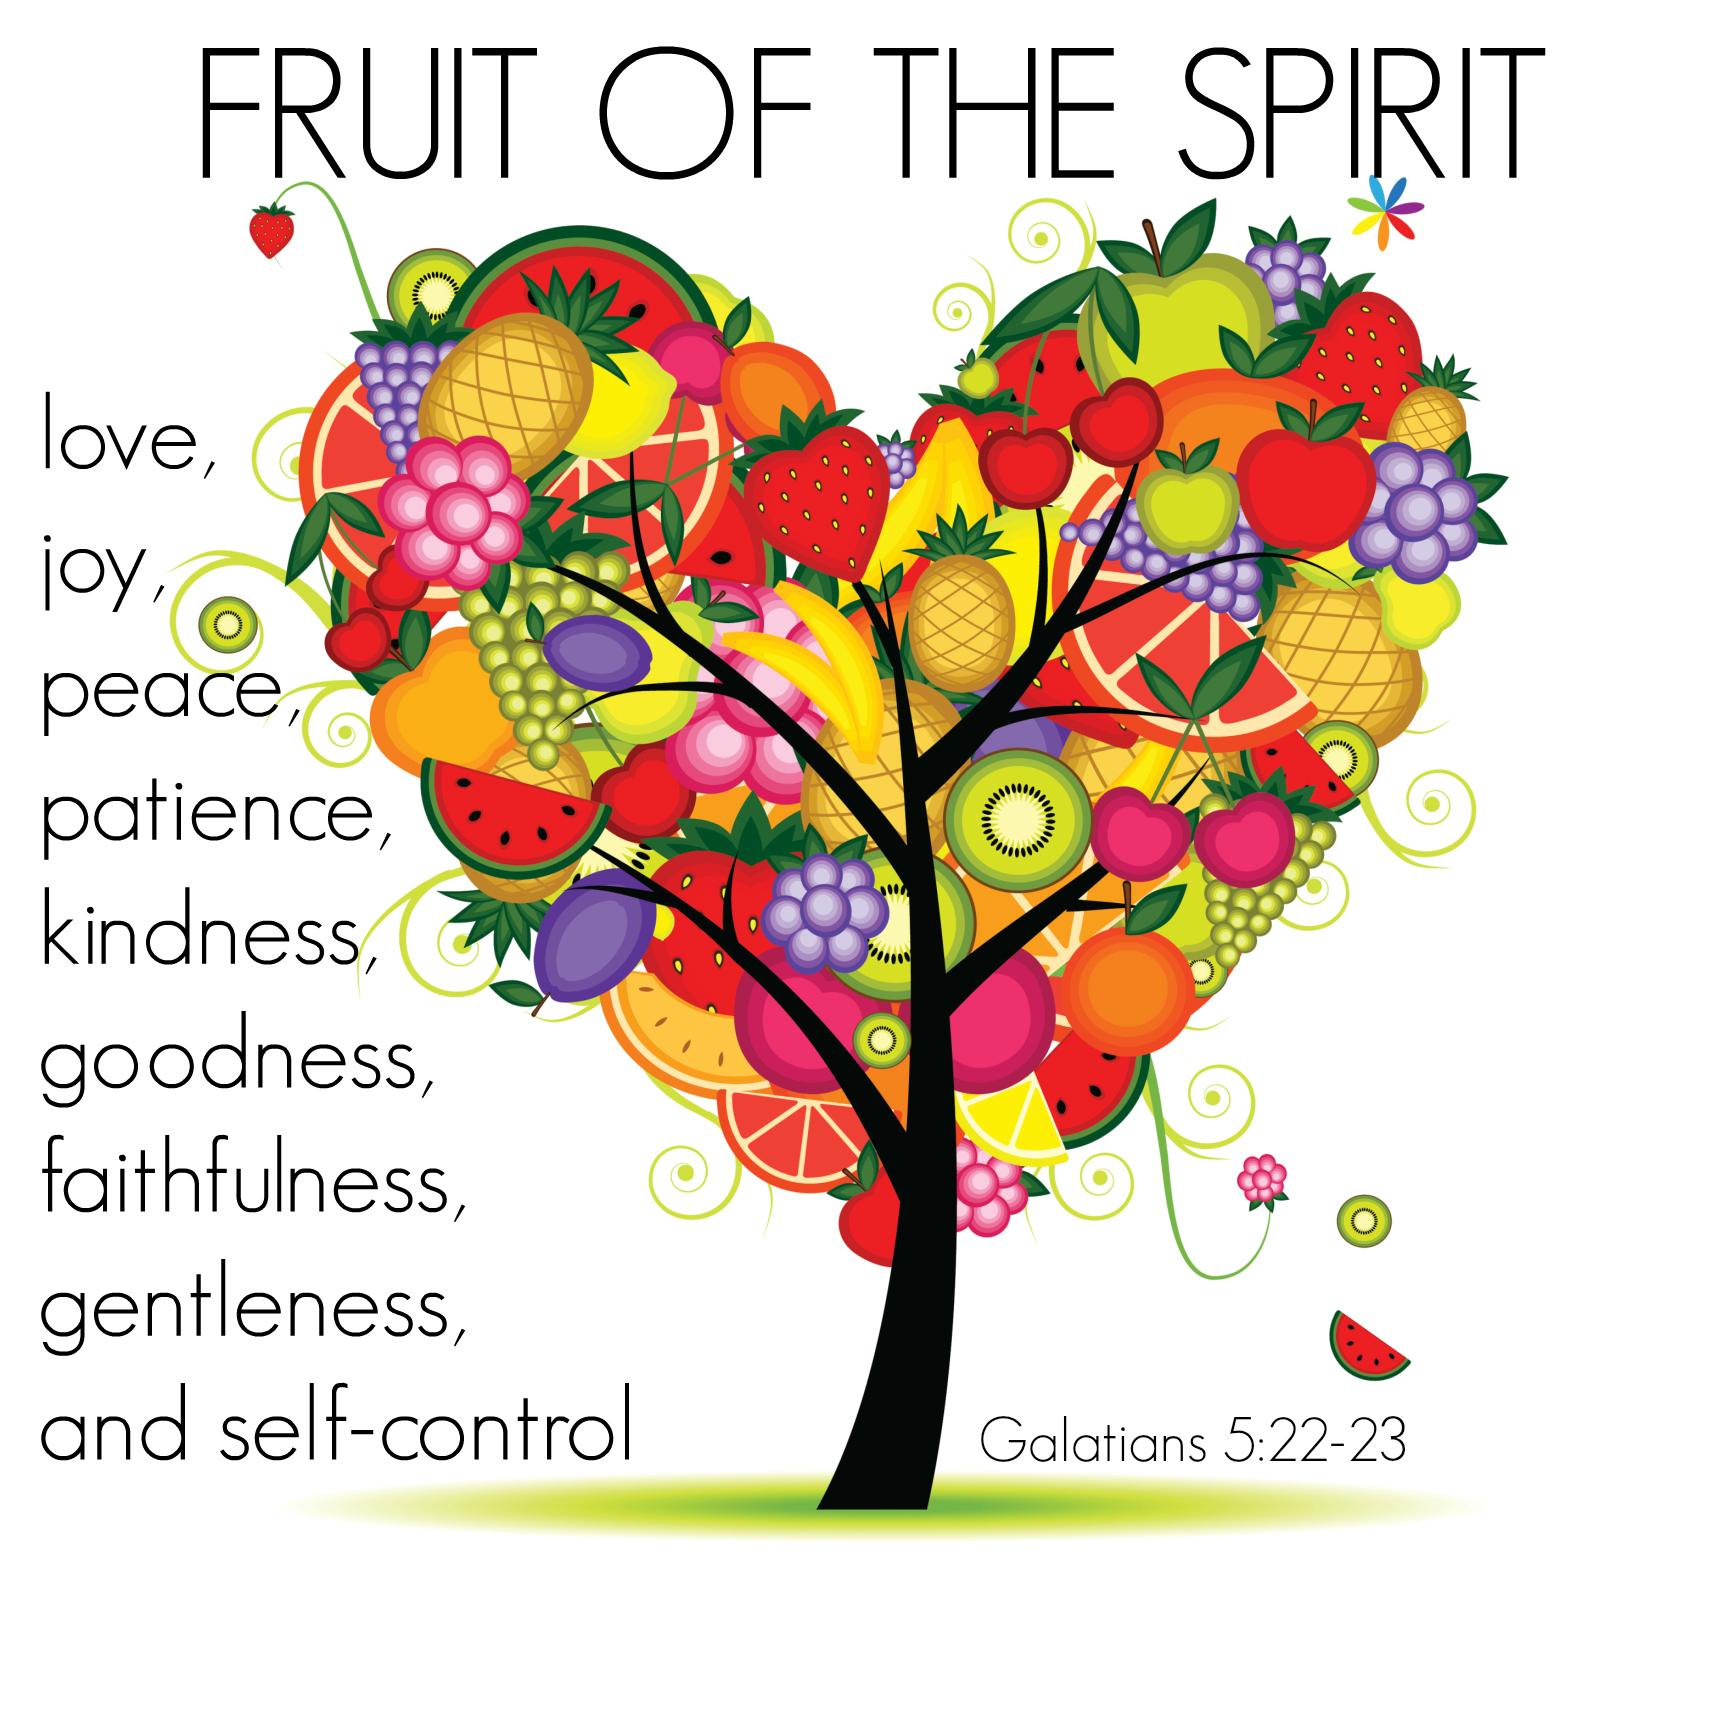 fruit-of-the-spirit-tree